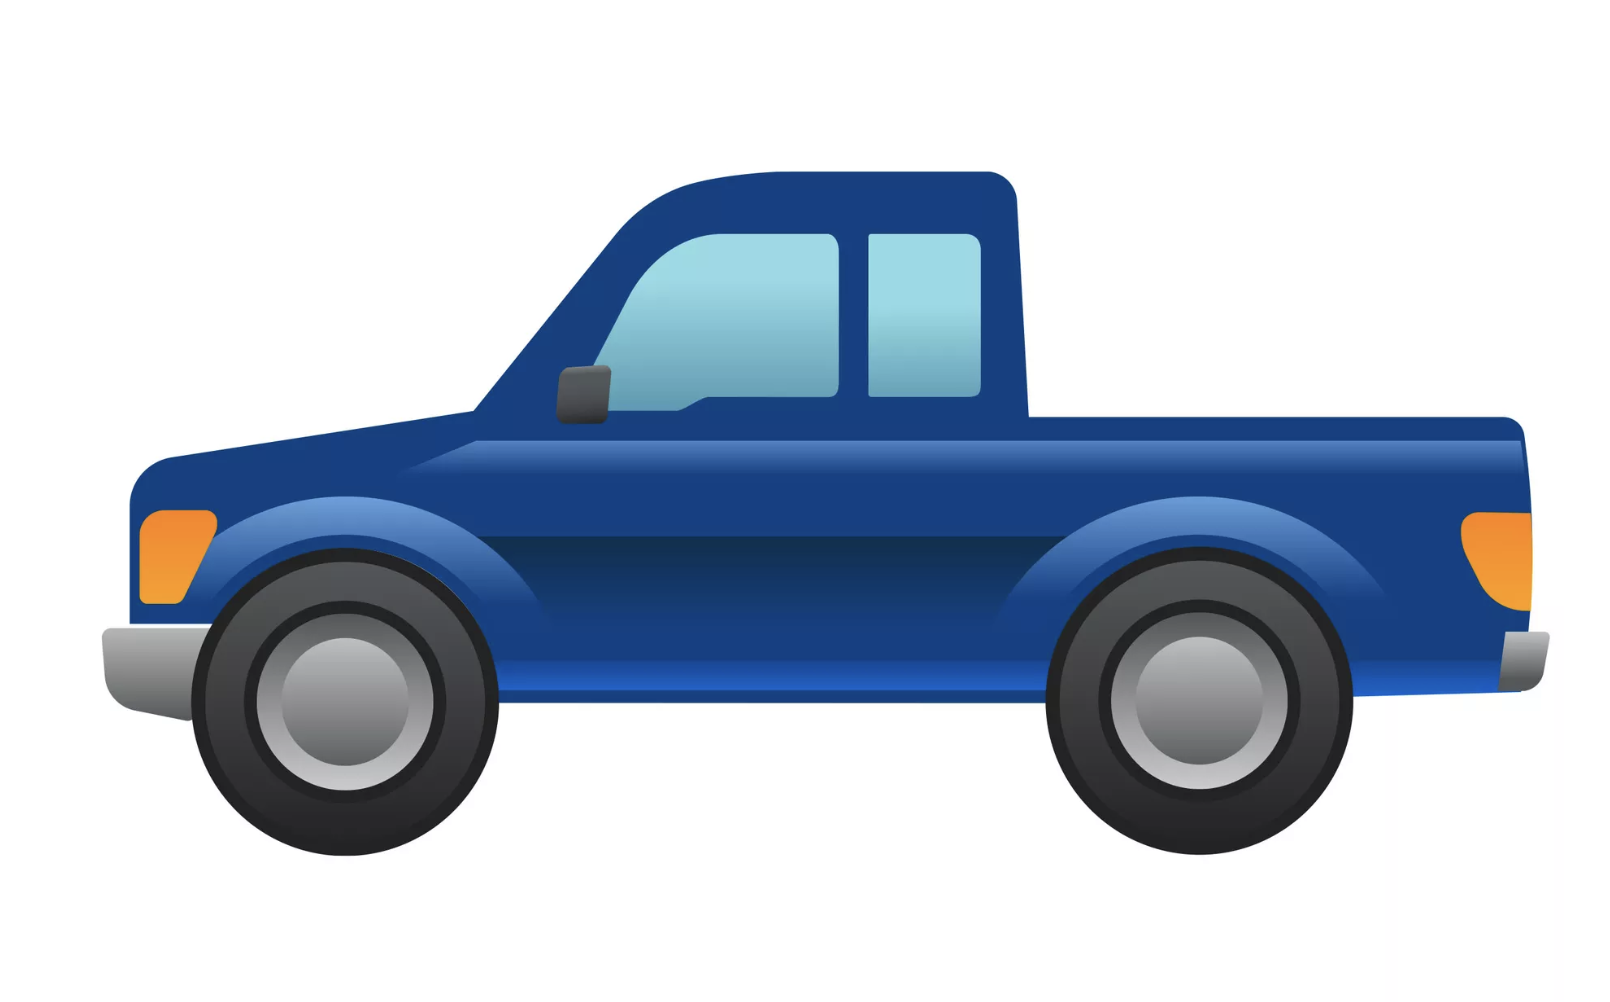 We Might Soon Be Getting a Pickup Truck Emoji